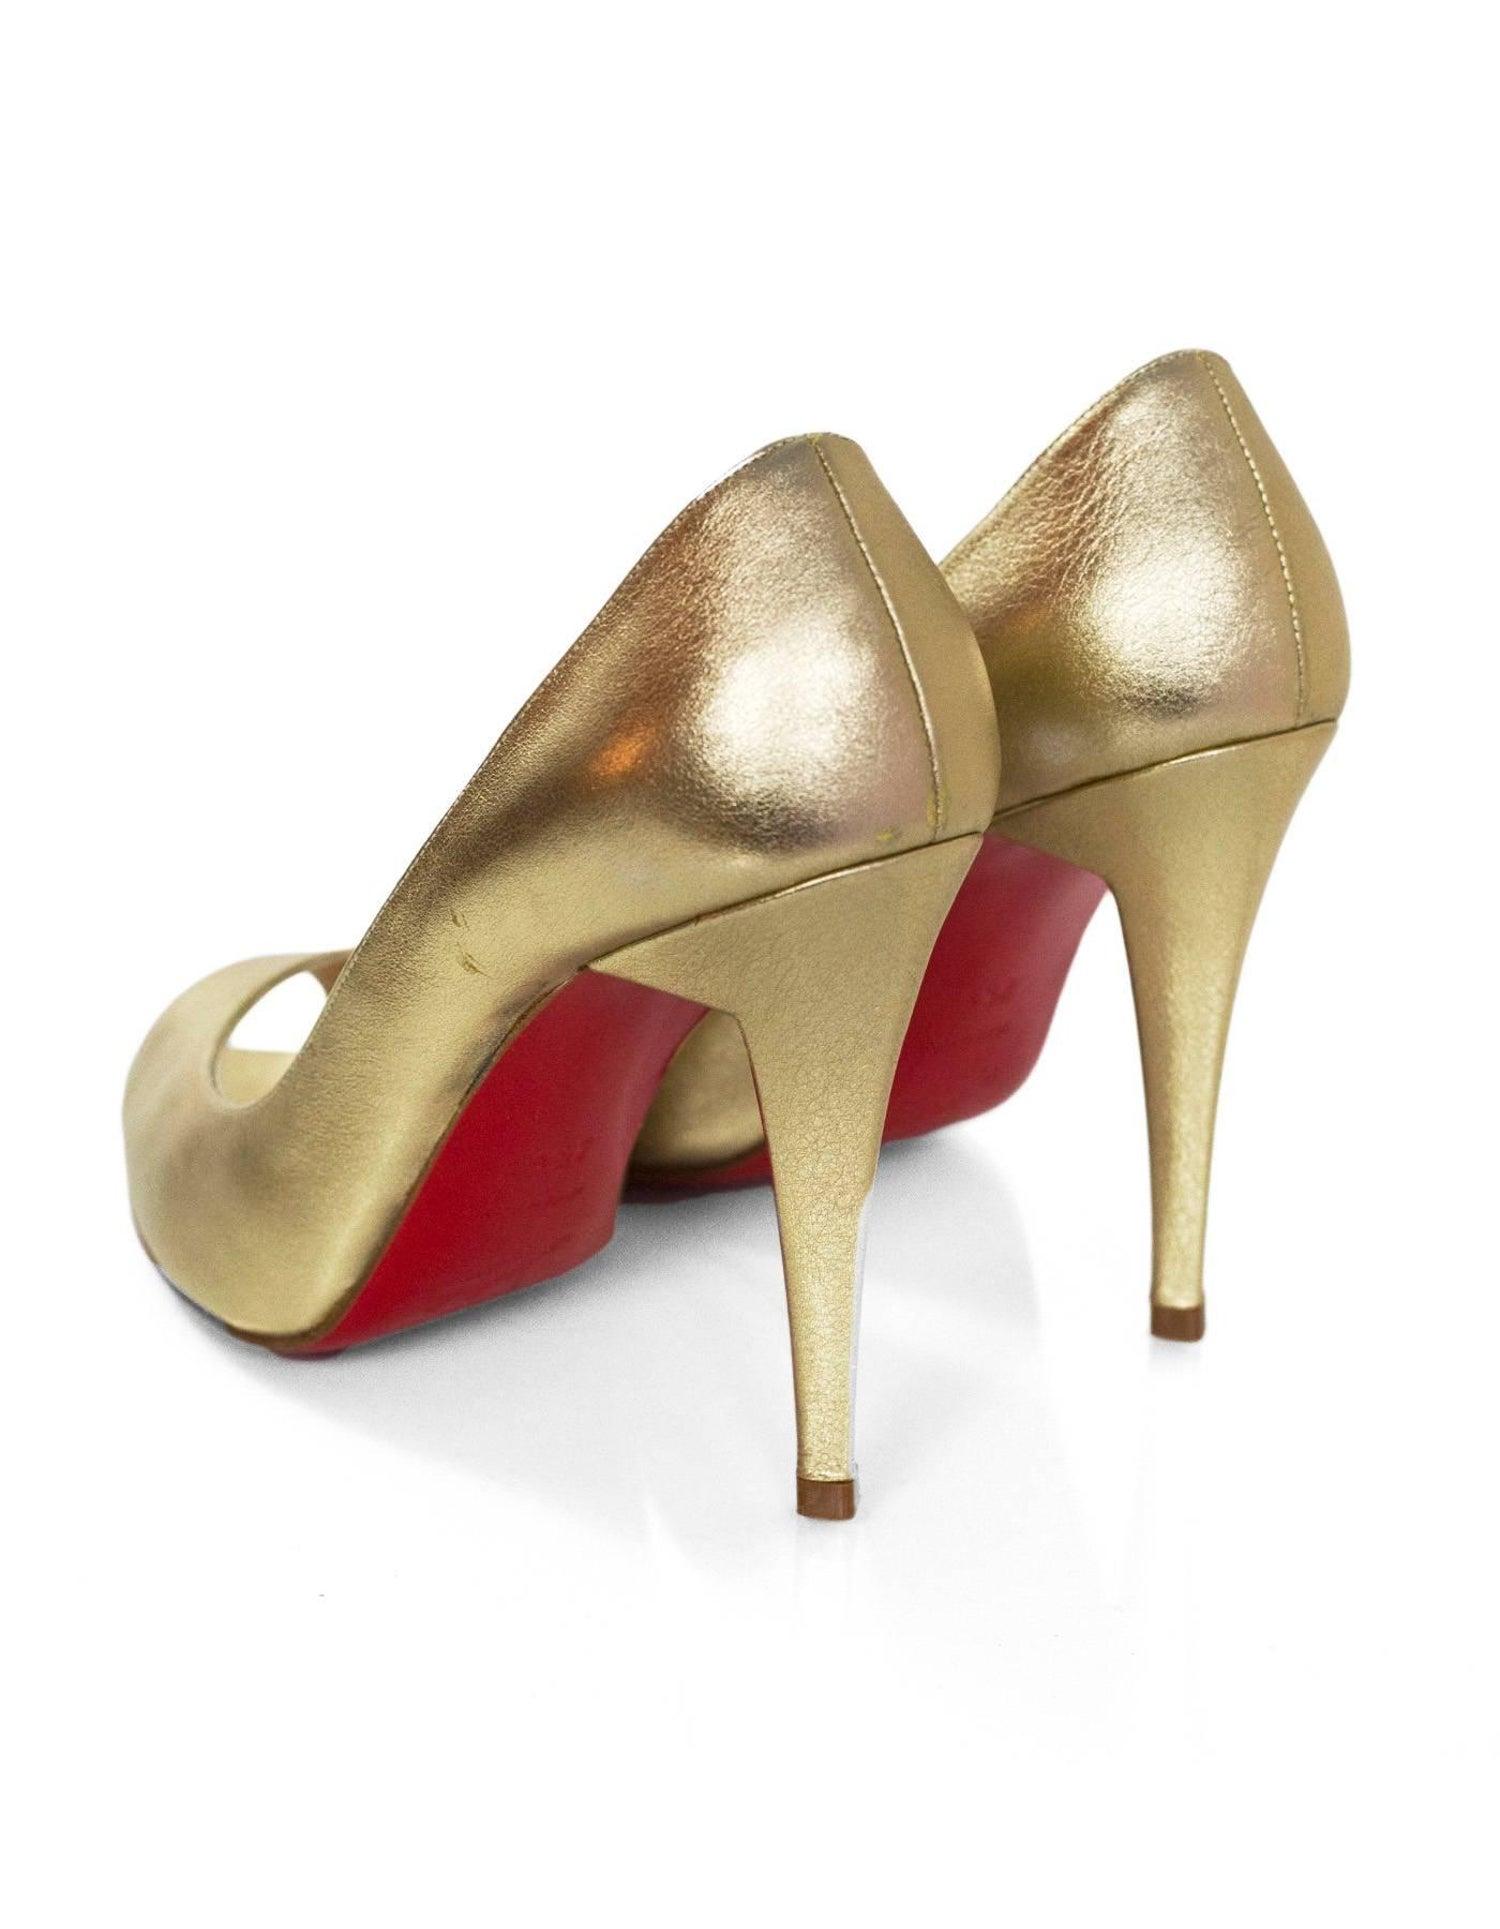 4d52355b2774 Christian Louboutin Gold Altadamia 100 Peep-Toe Pumps Sz 35.5 NEW For Sale  at 1stdibs